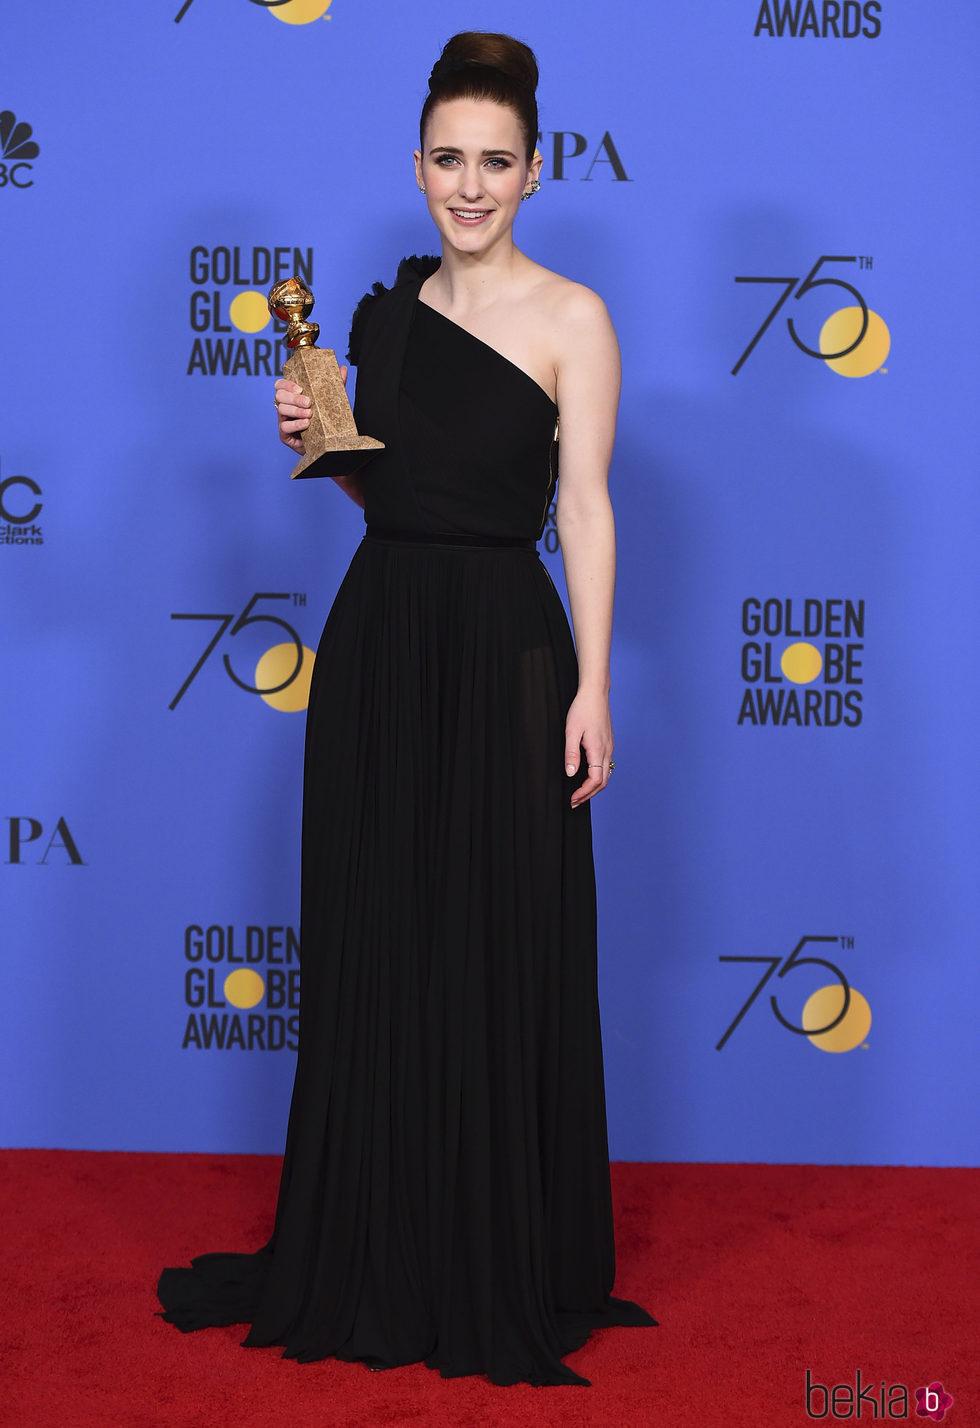 Rachel Brosnahan con su Globo de Oro 2018 por 'The Marvelous Mrs. Maisel'